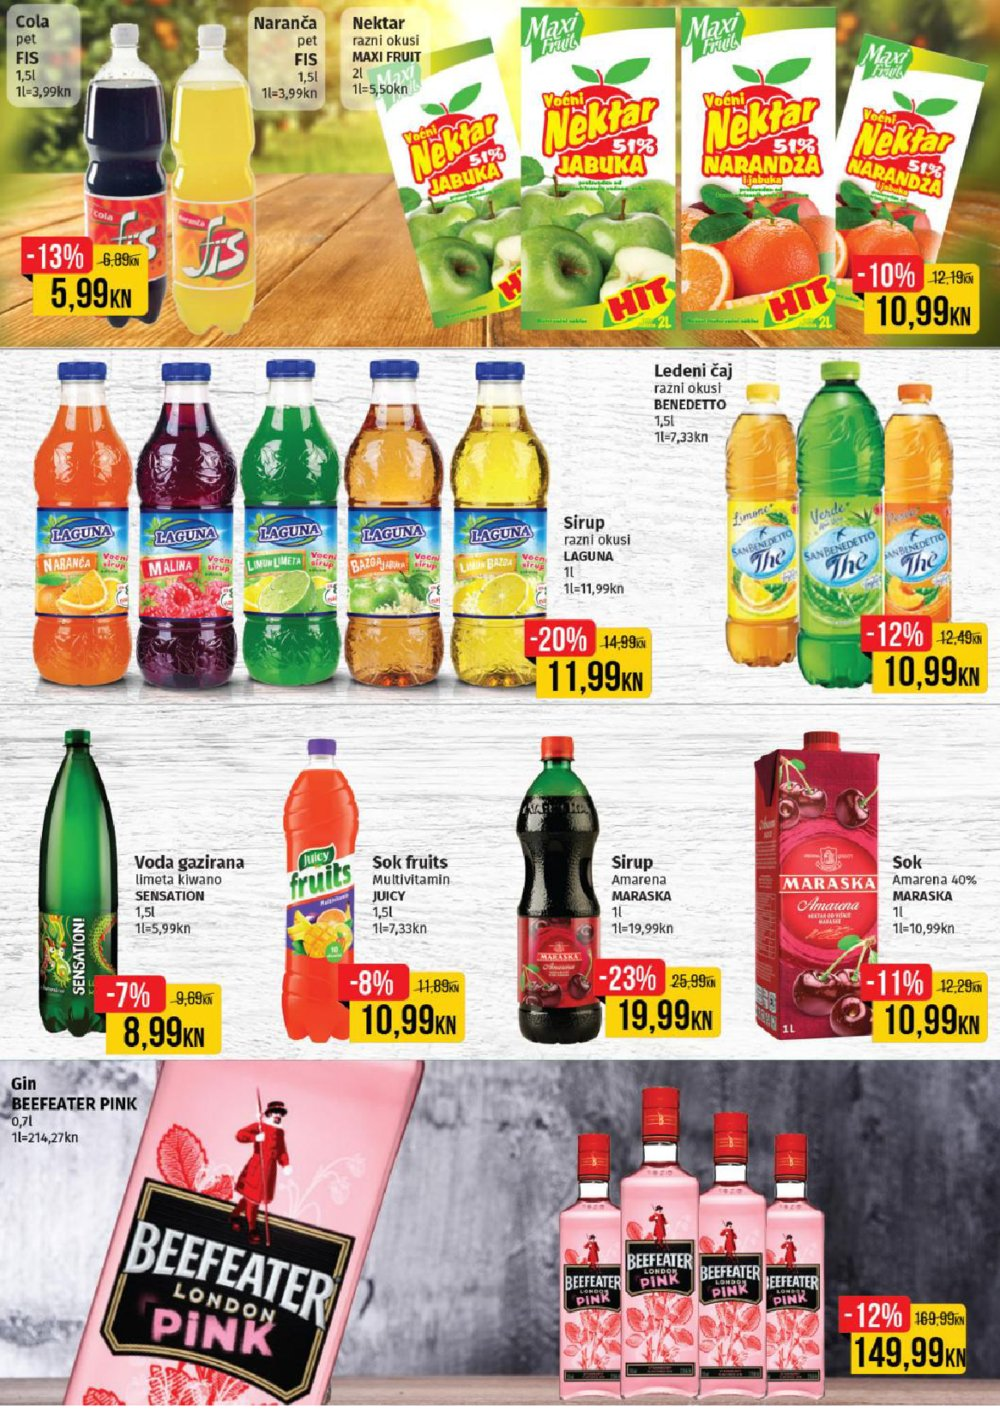 Istarski supermarketi katalog Akcija 12.02.-25.08.2019.